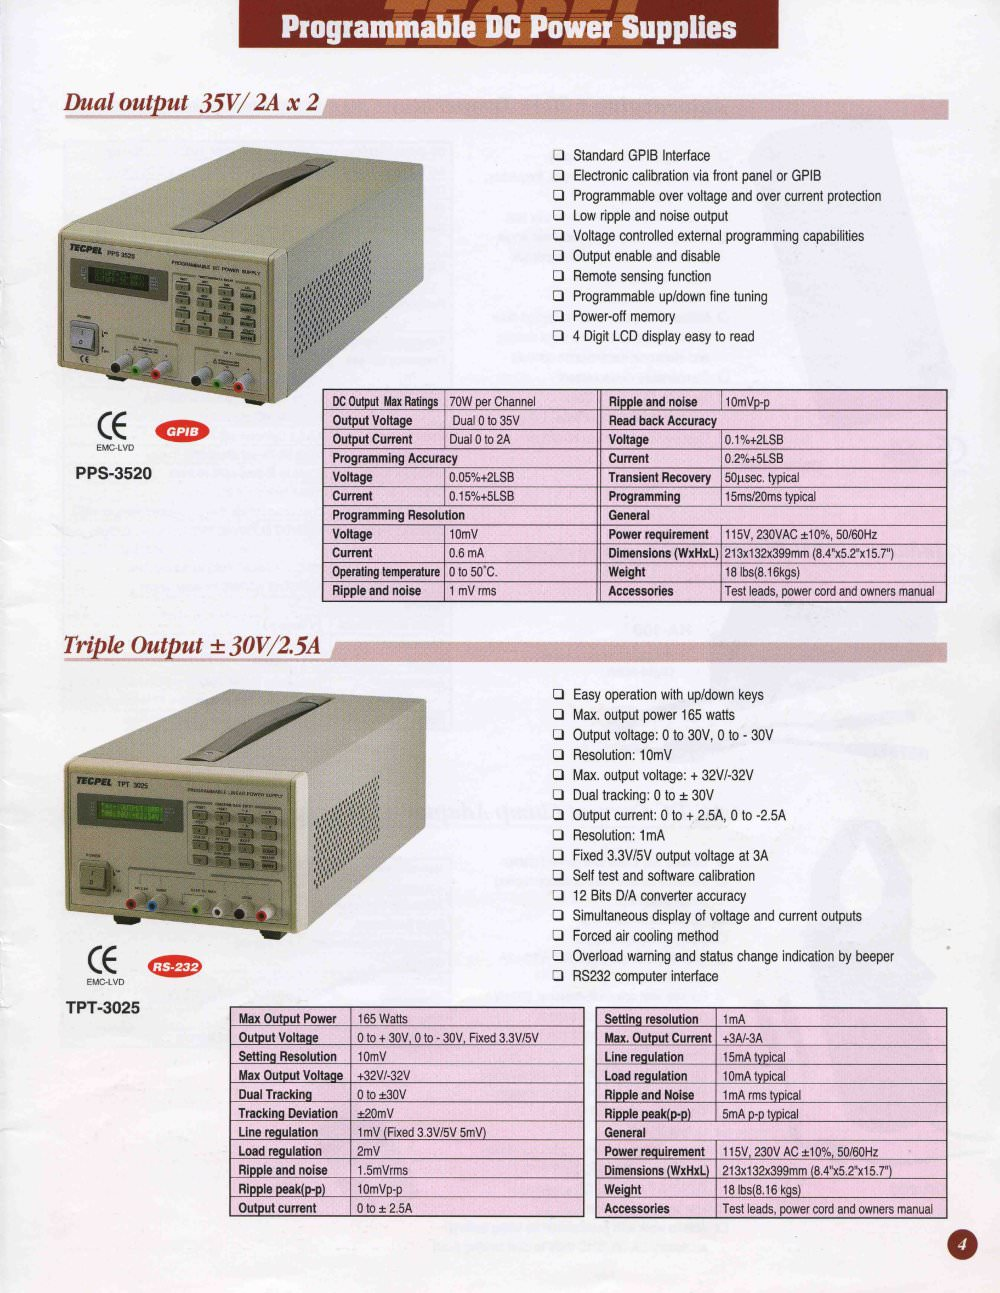 Programmable DC Linear Power Supplies - Tecpel Co , Ltd  - PDF